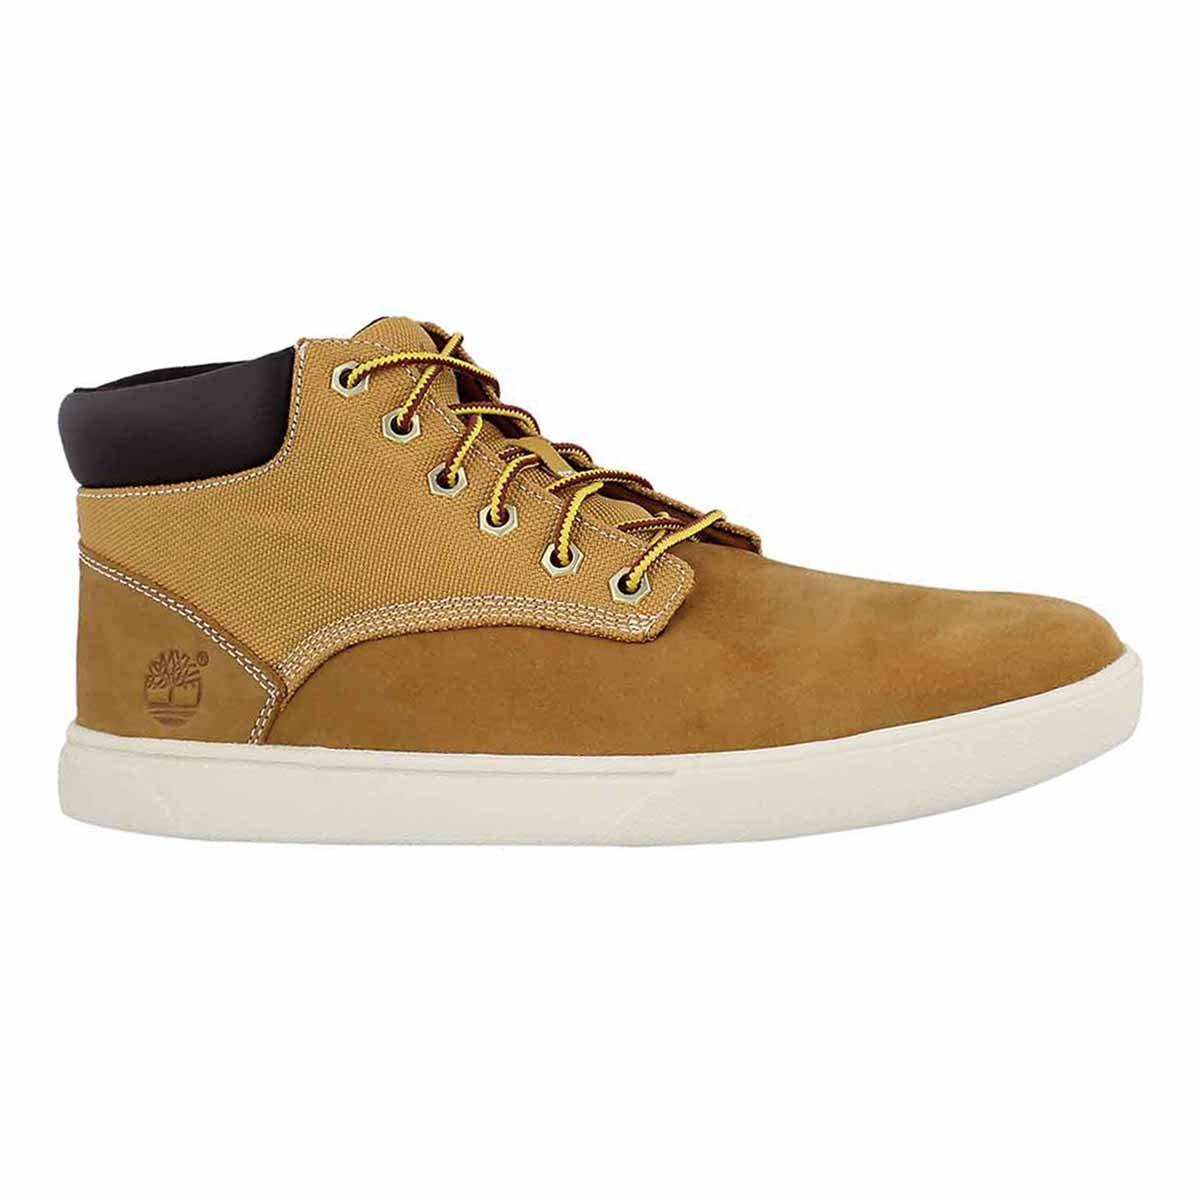 Men's GROVETON PLAIN TOE wheat chukka boots